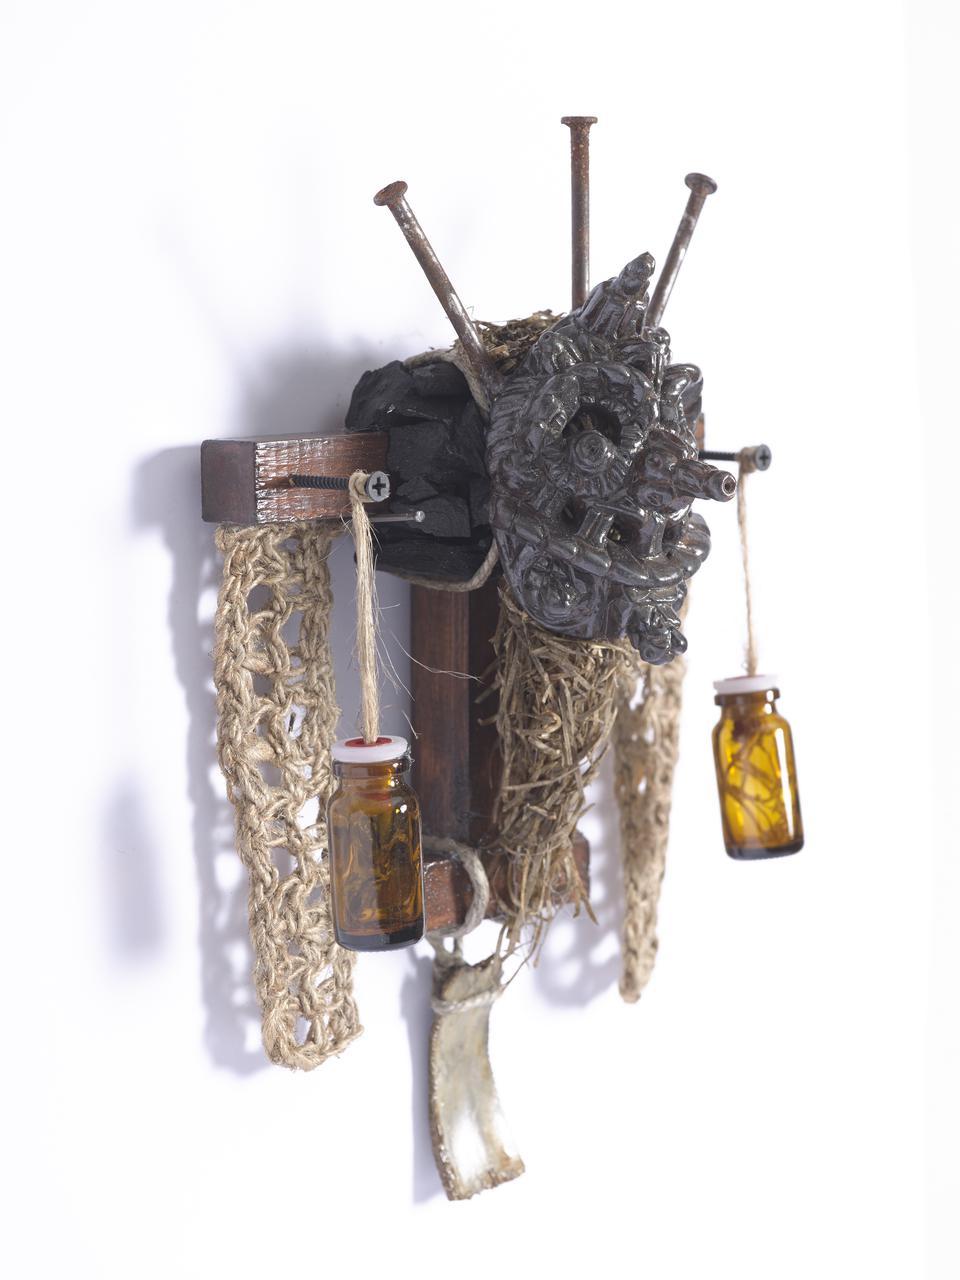 Marios Fournaris, Untitled,  ceramic mask, hay, jute,  bone, glass, wood, iron, charcoal, 2017